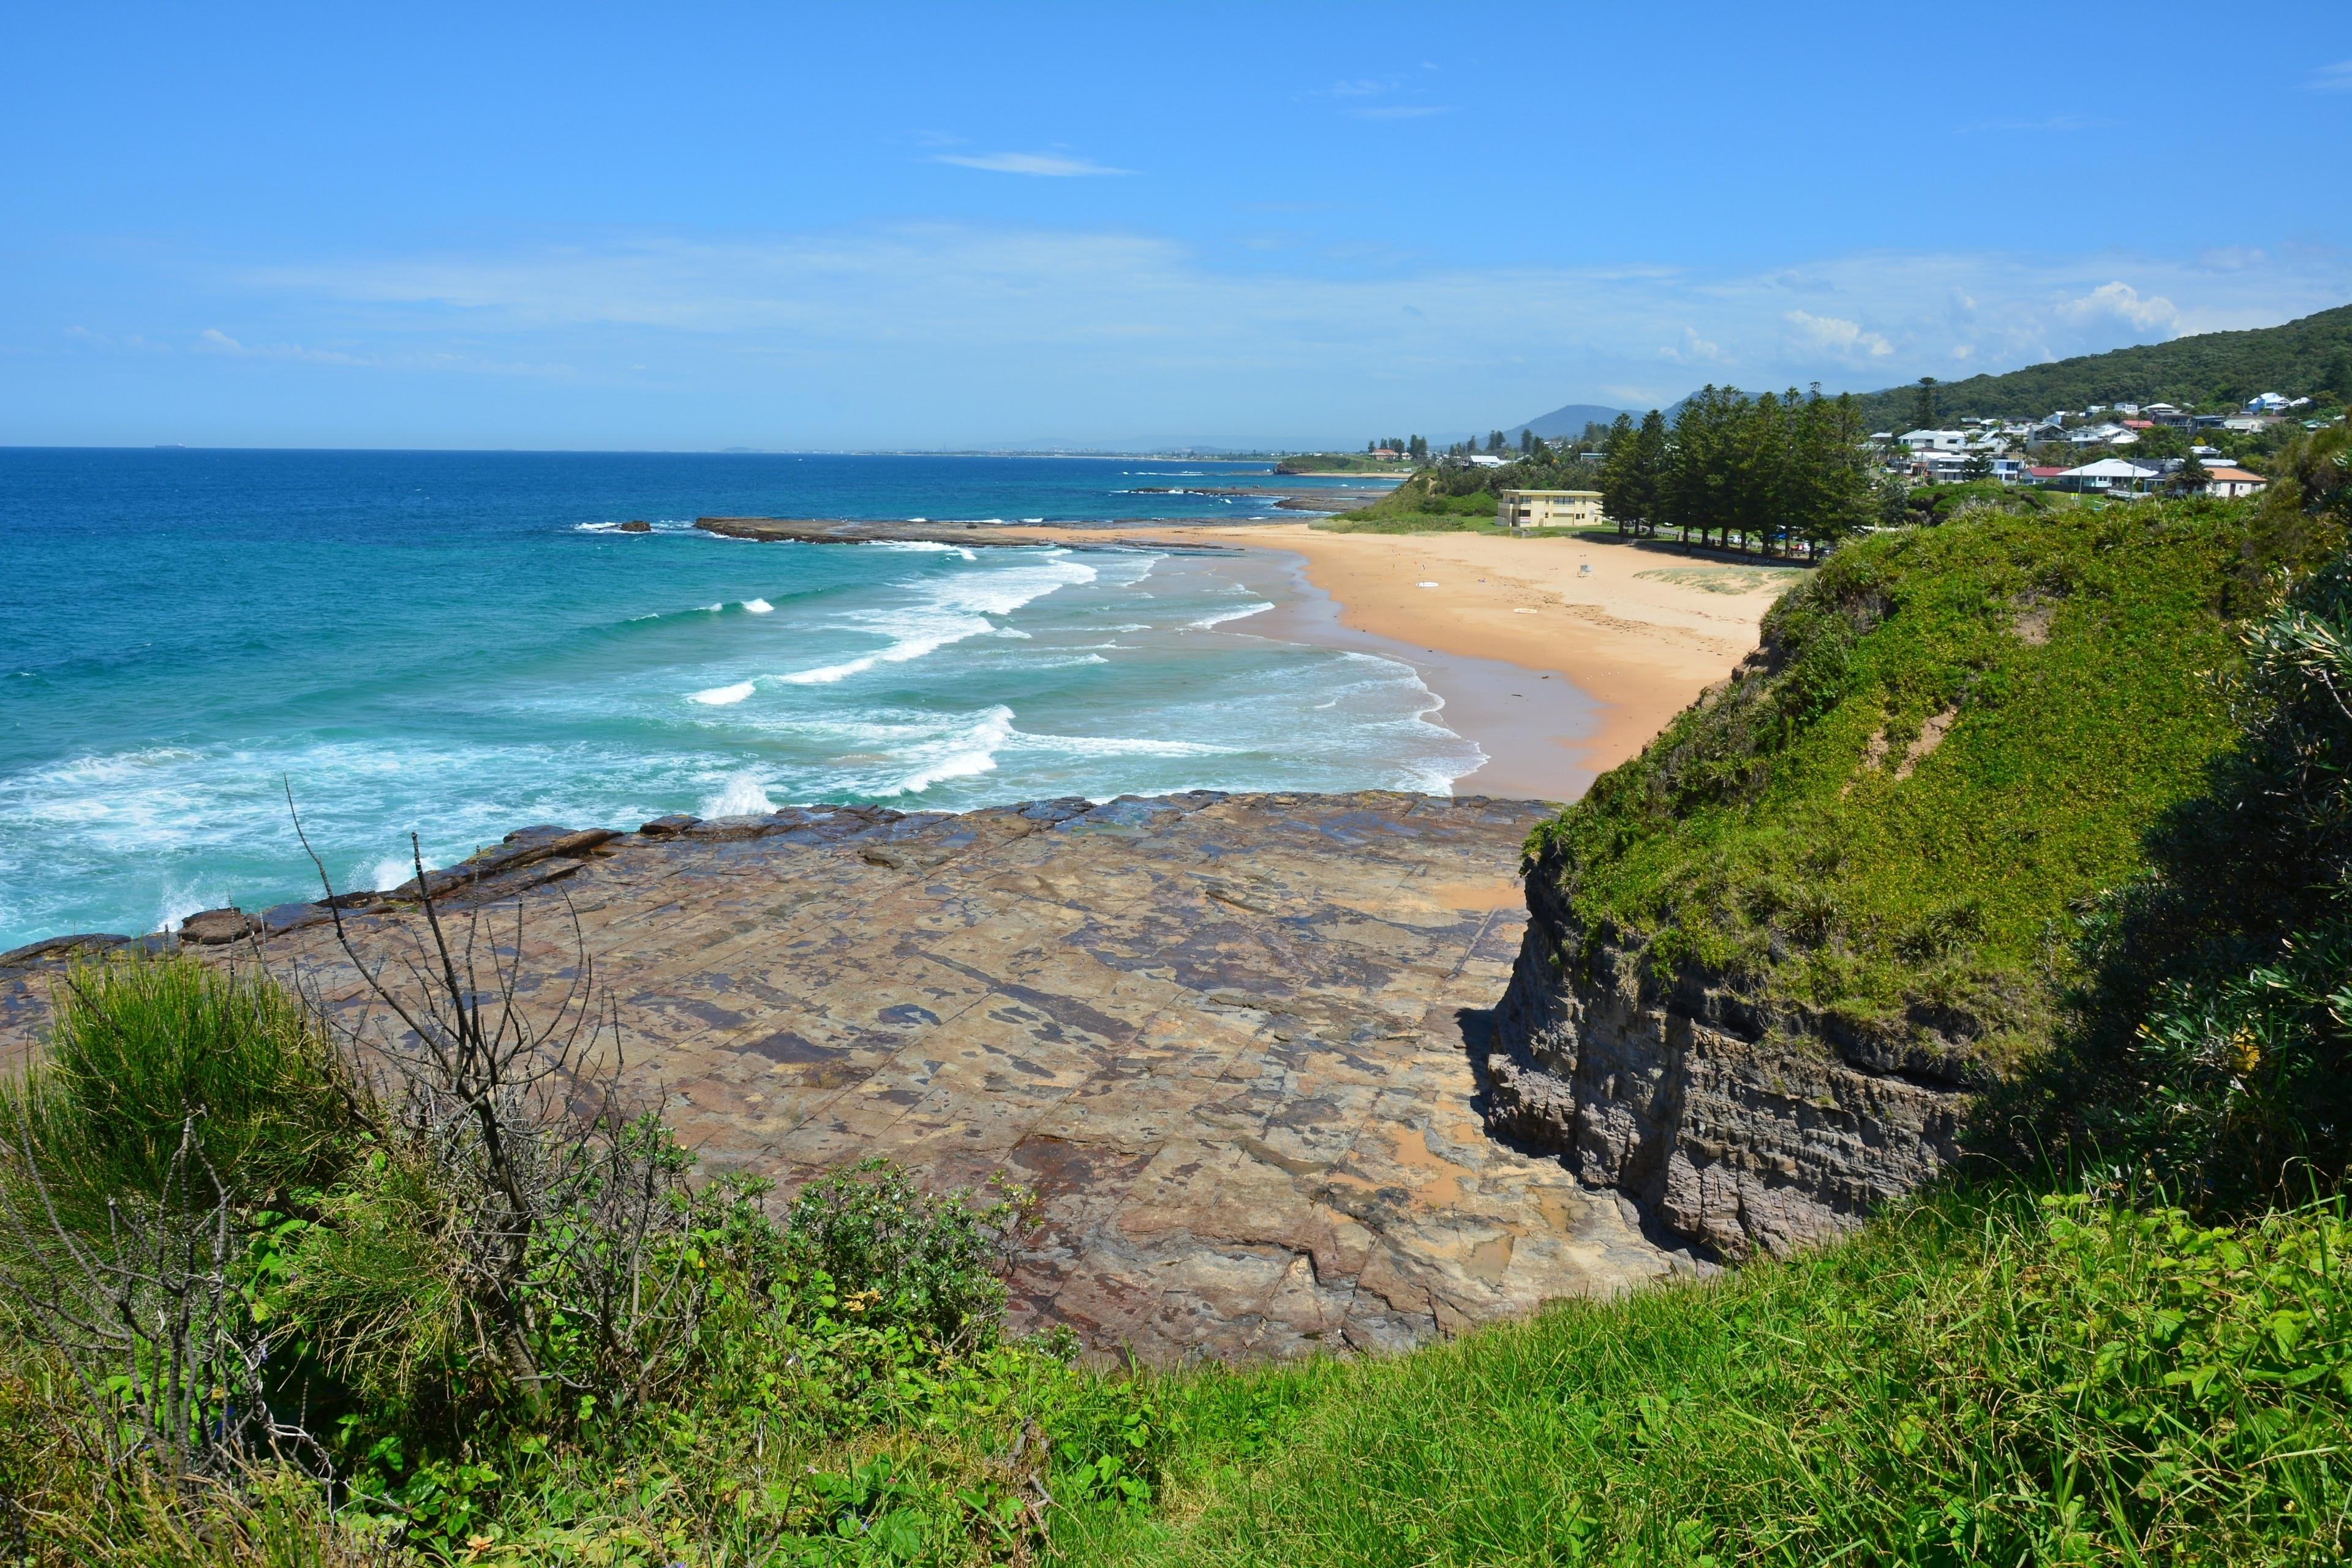 Austinmer, Wollongong, New South Wales, Australia